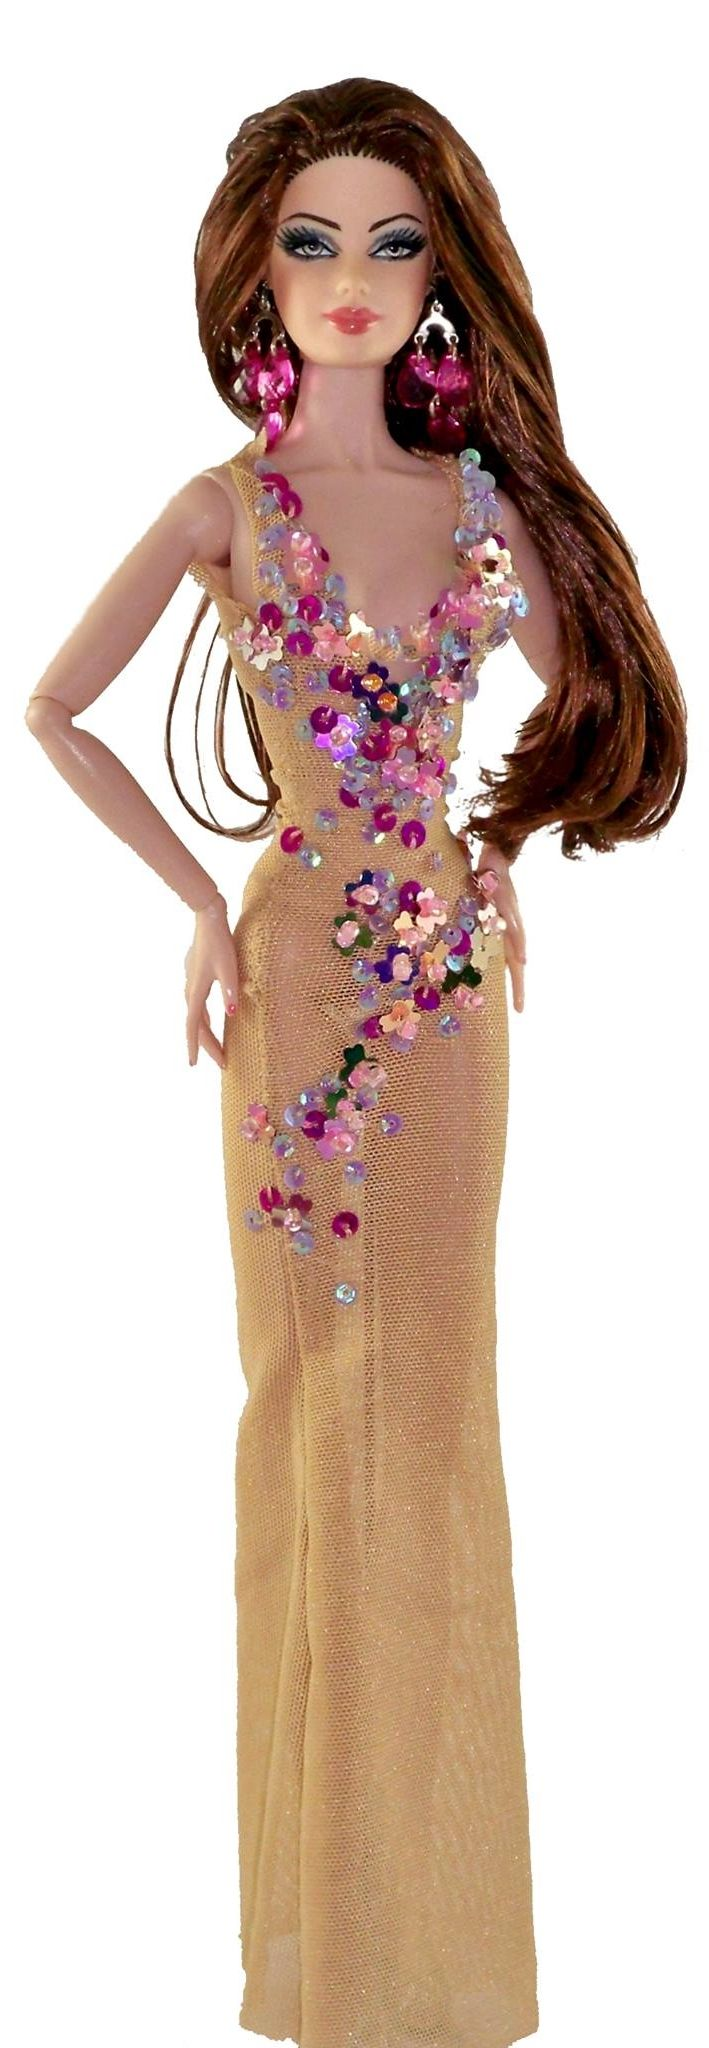 image Danish beauty barbie boller 1gr2